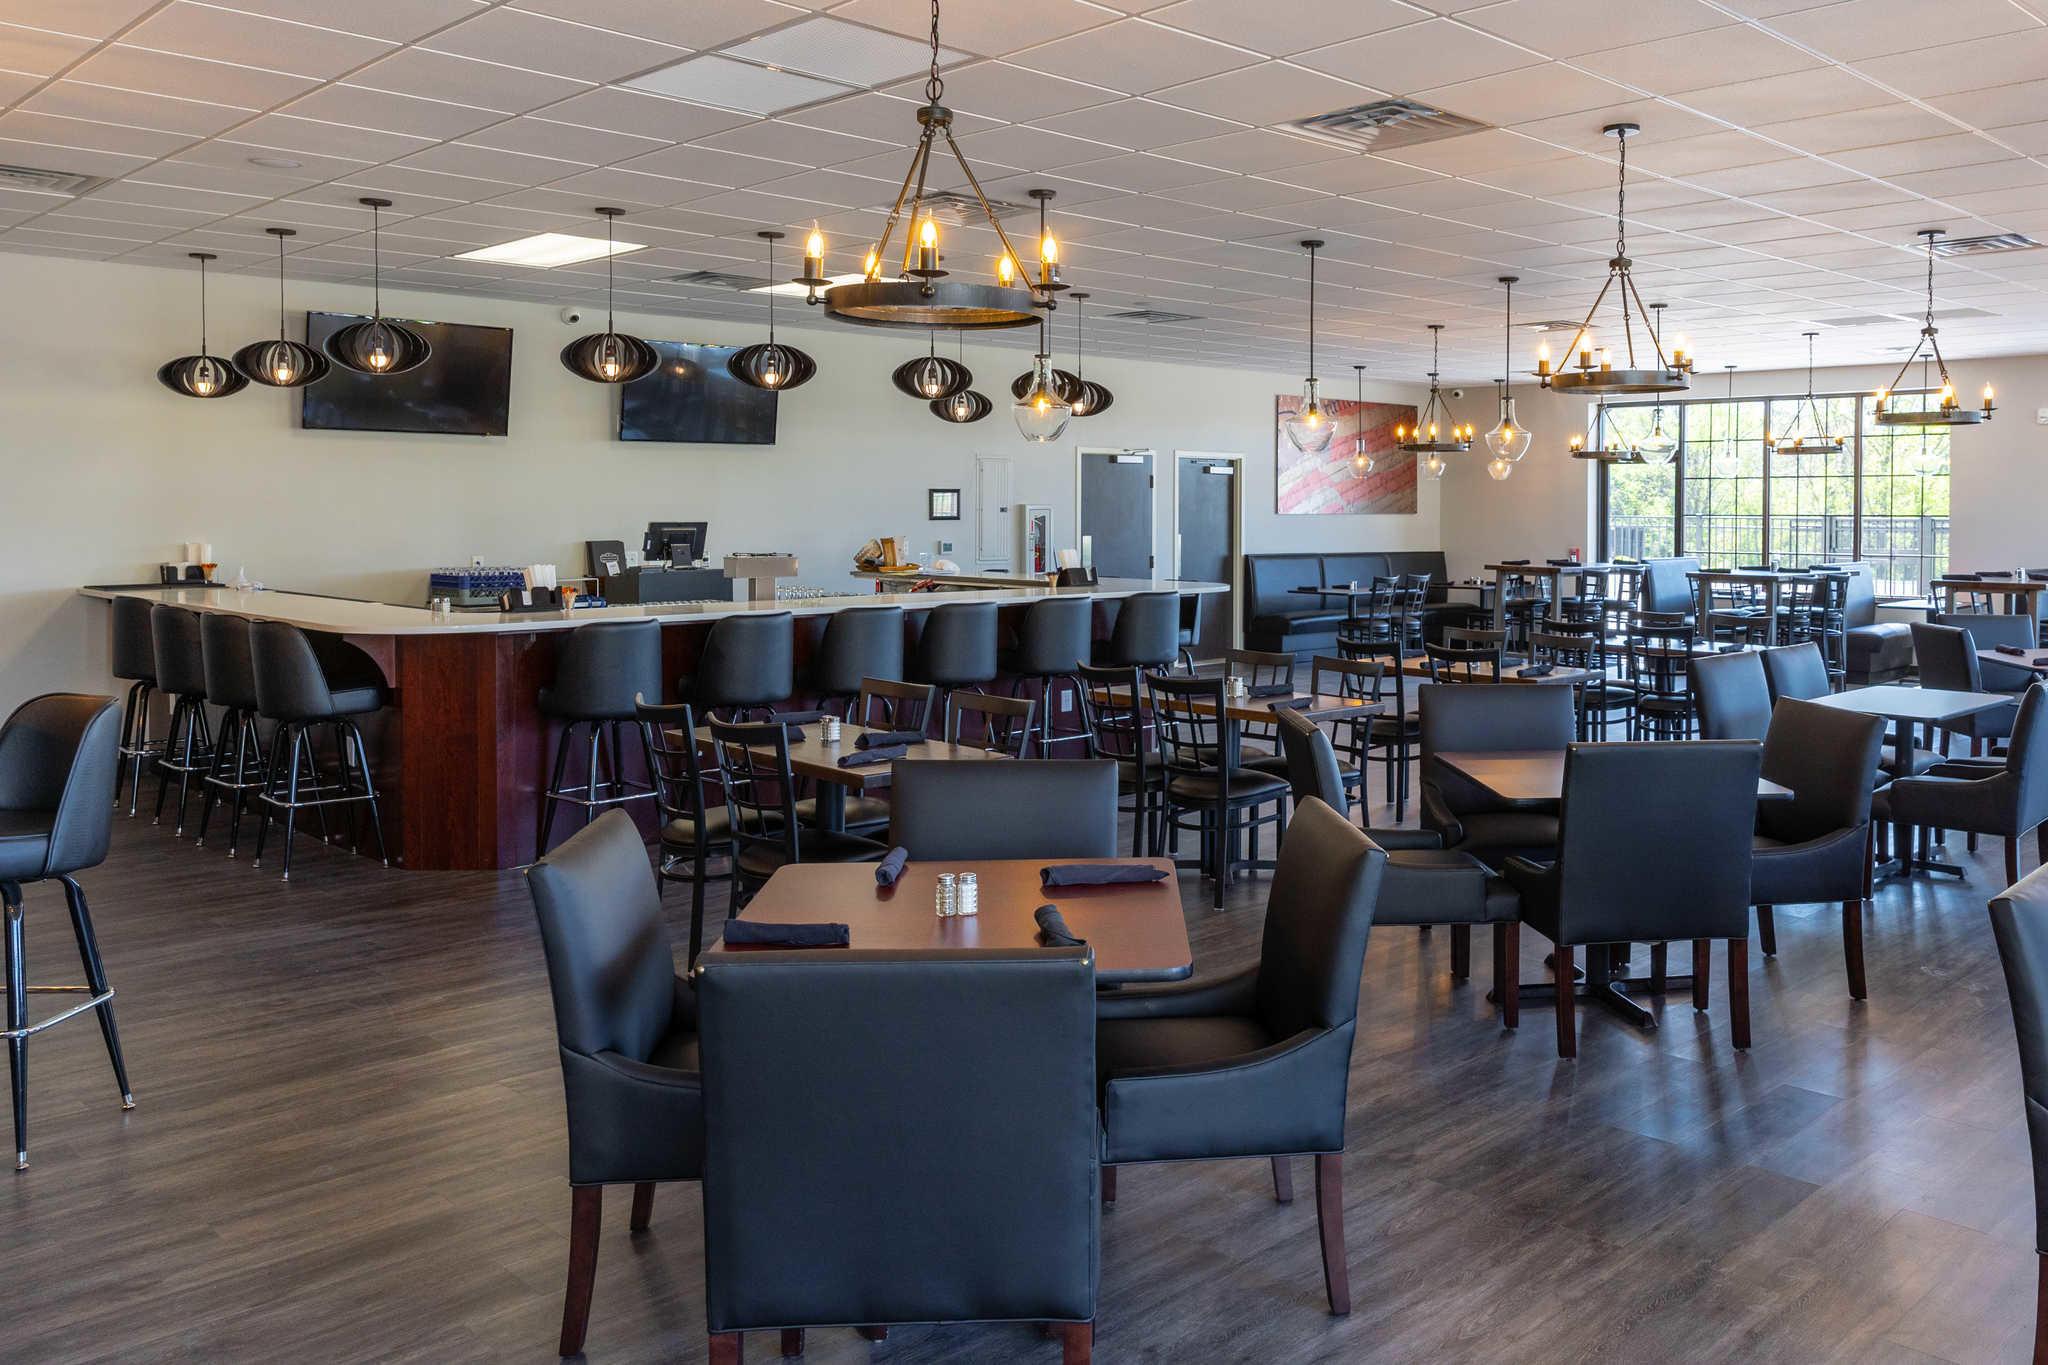 Clarion Inn & Suites image 30